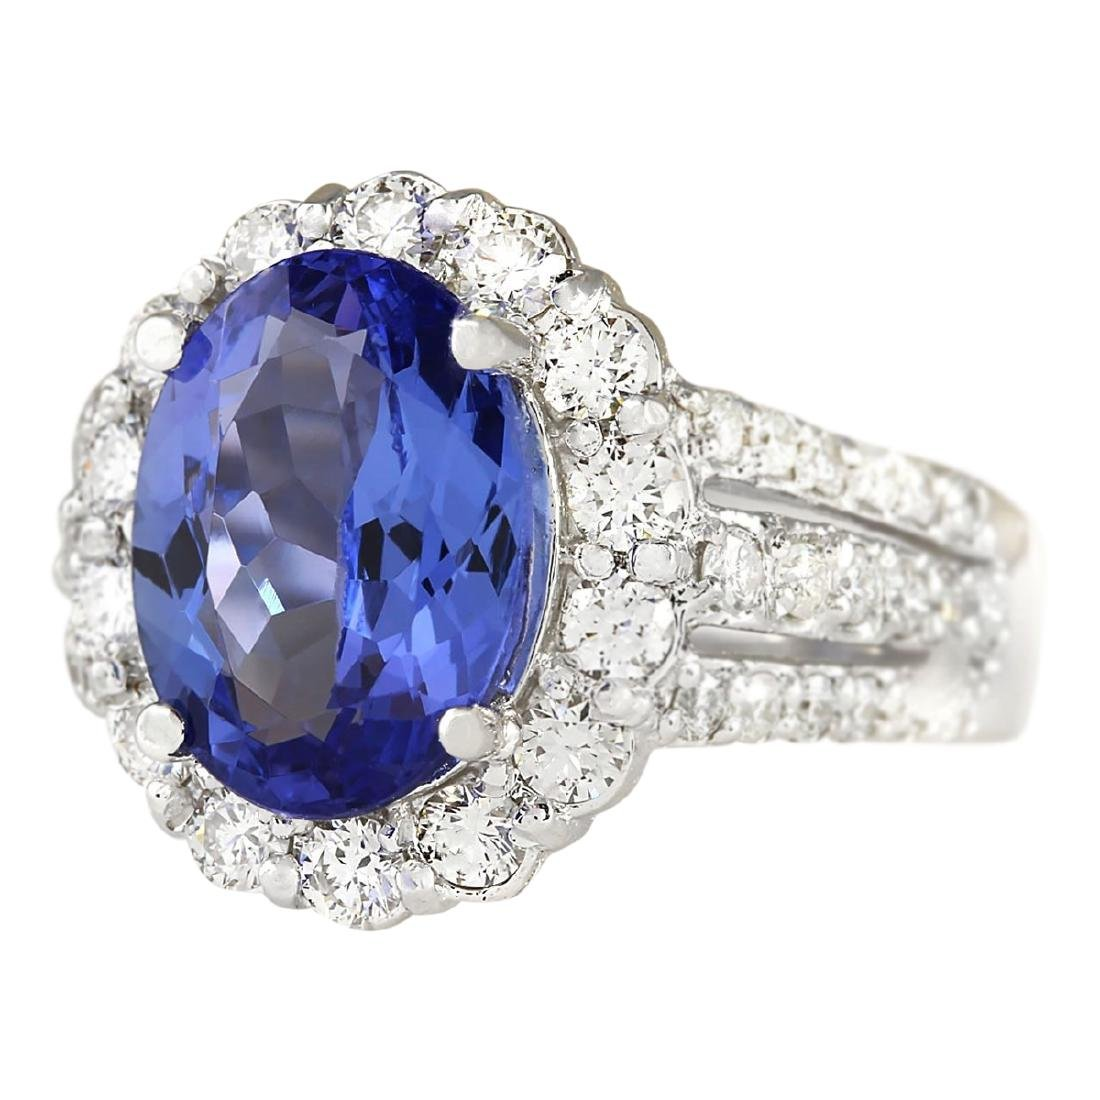 5.42 CTW Natural Blue Tanzanite And Diamond Ring 18K - 2